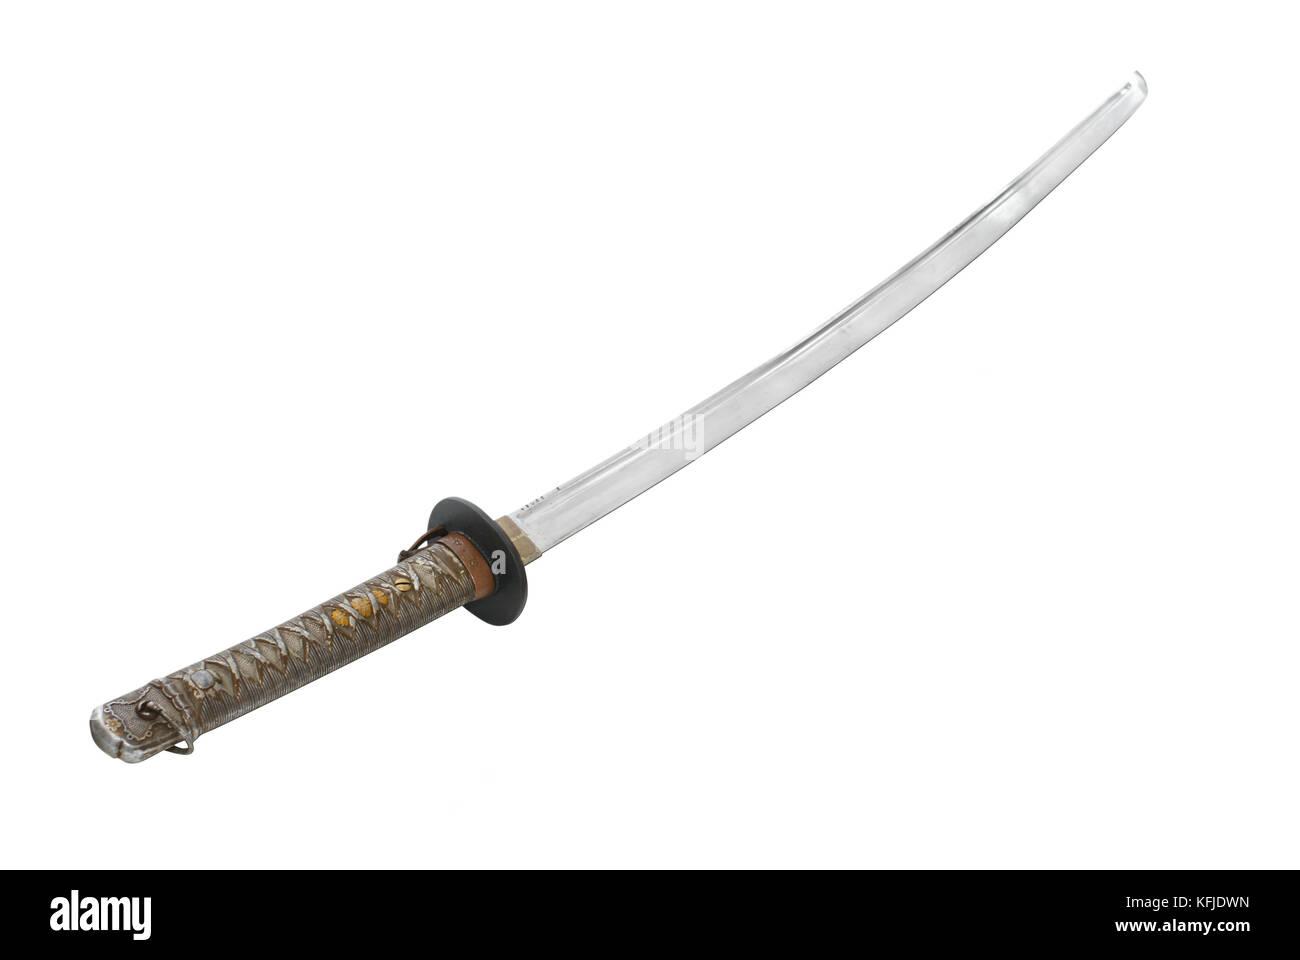 Samurai Sword Close Up Stock Photos Pro Knife Japanese Sergeants New Military Shin Gunt 1939 44